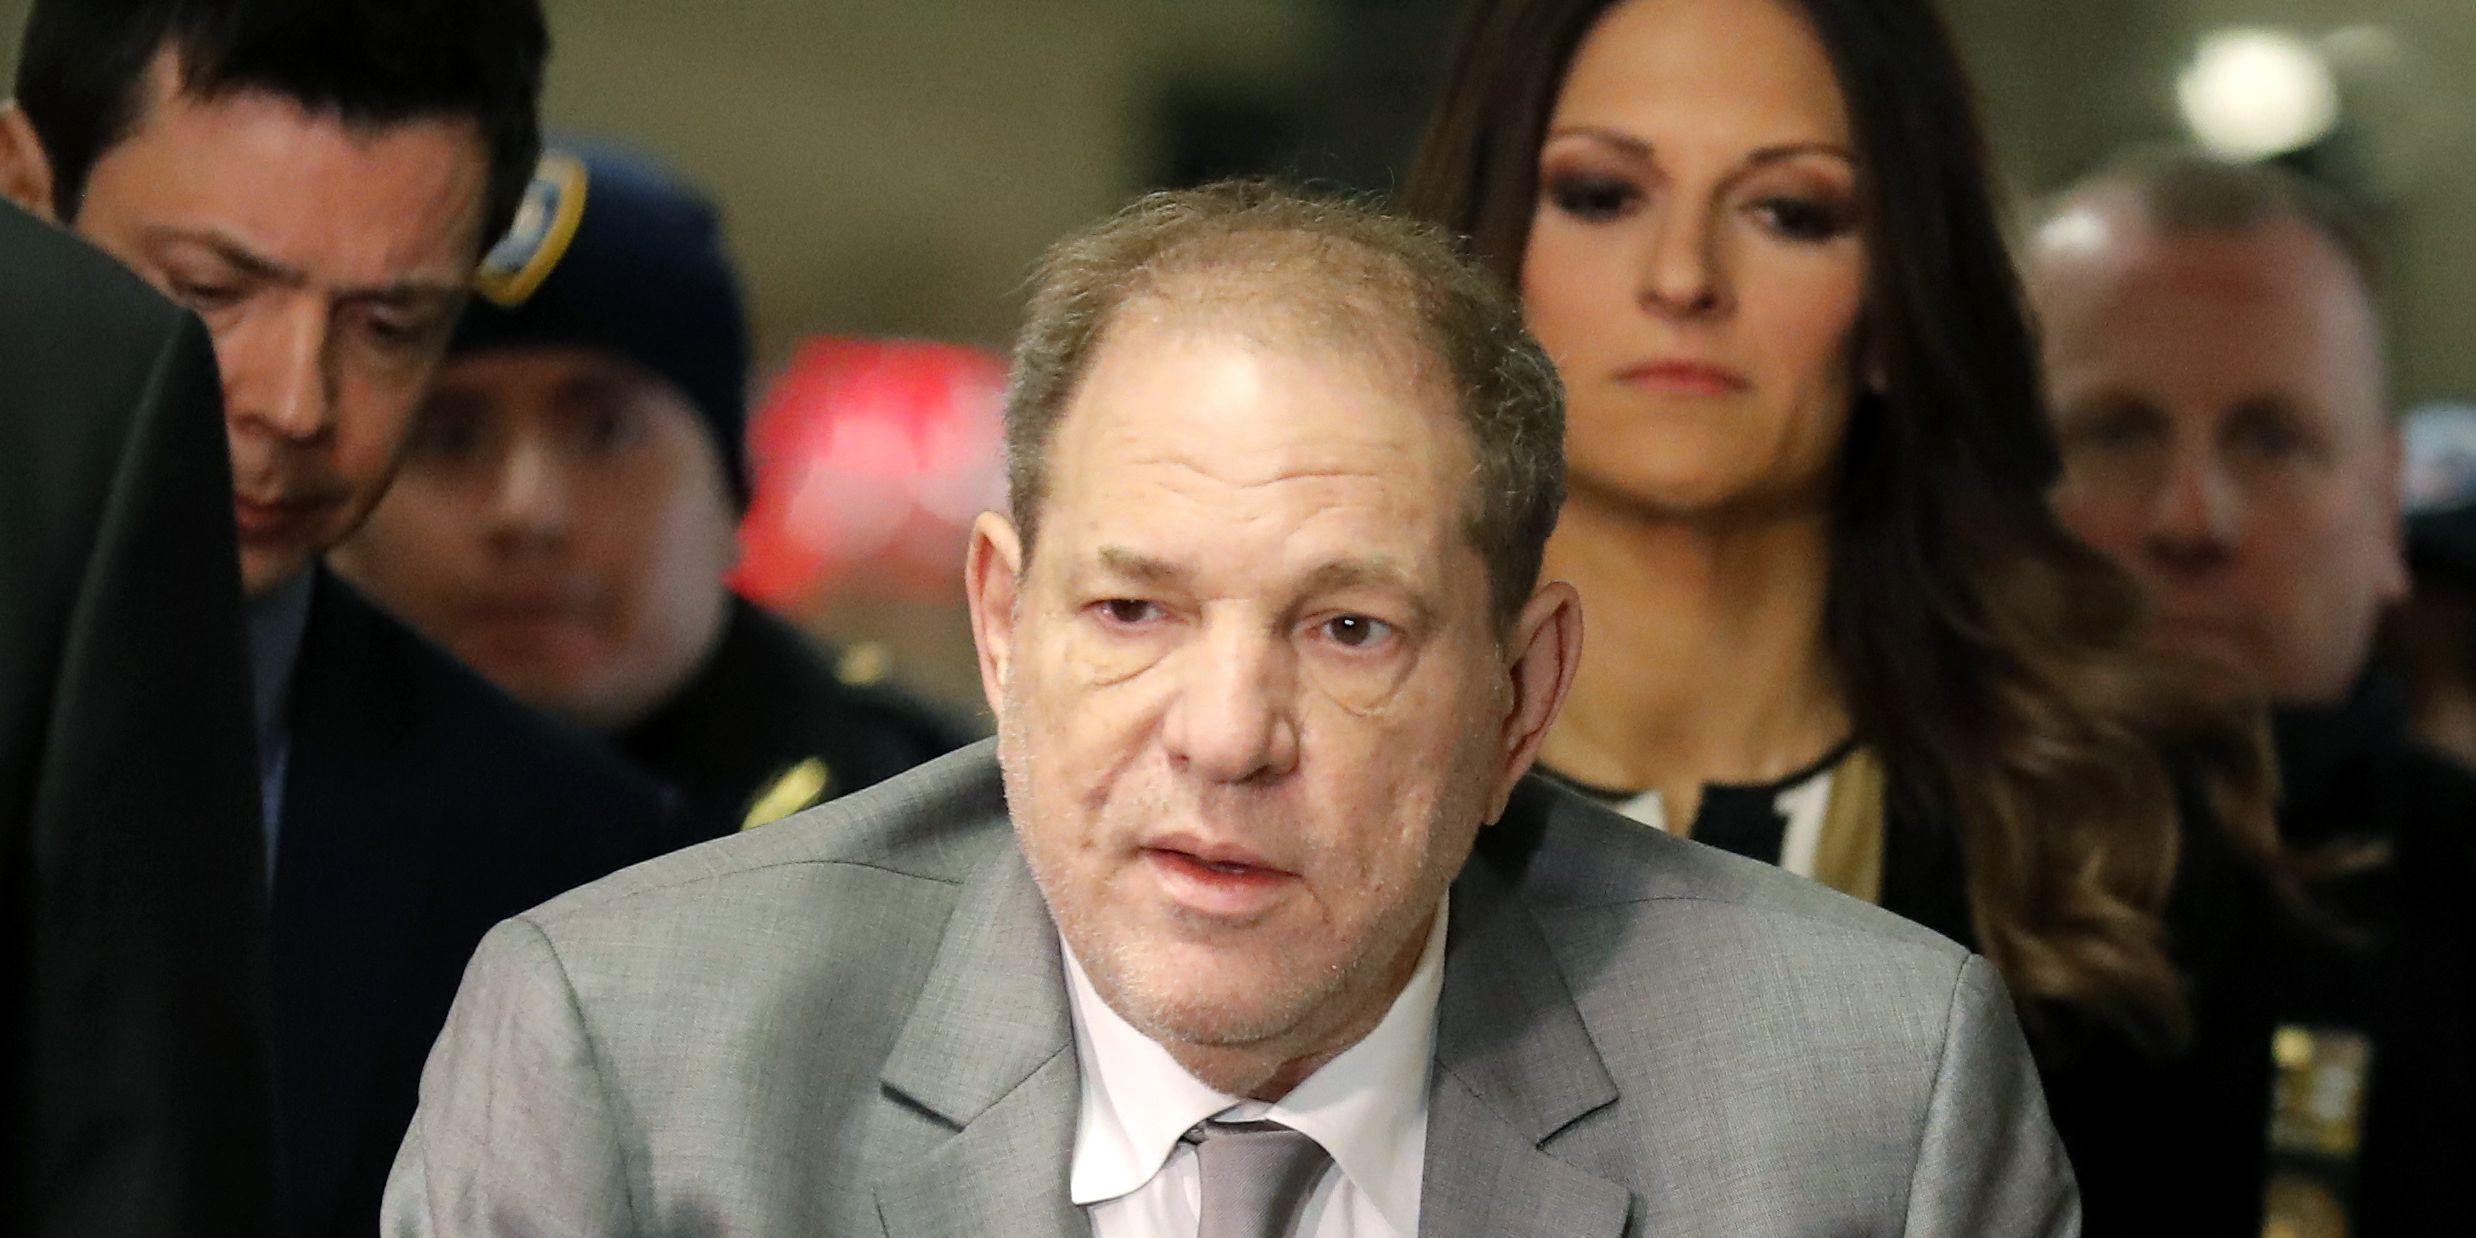 Weinstein trial opens, portraying ex-producer as predator